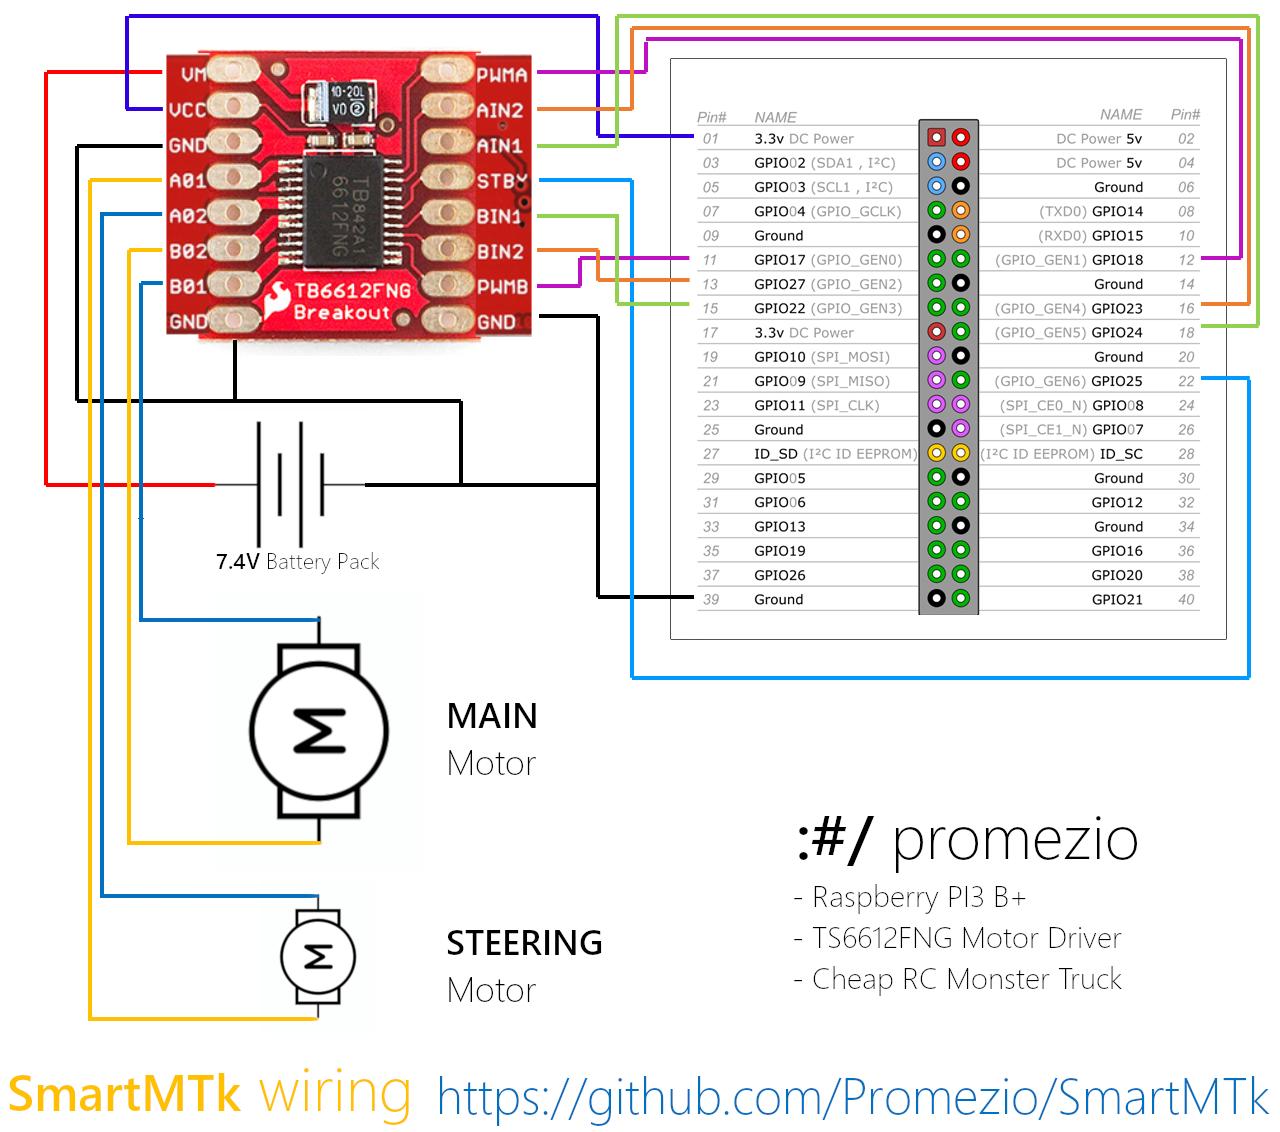 SmartMTk wiring diagram